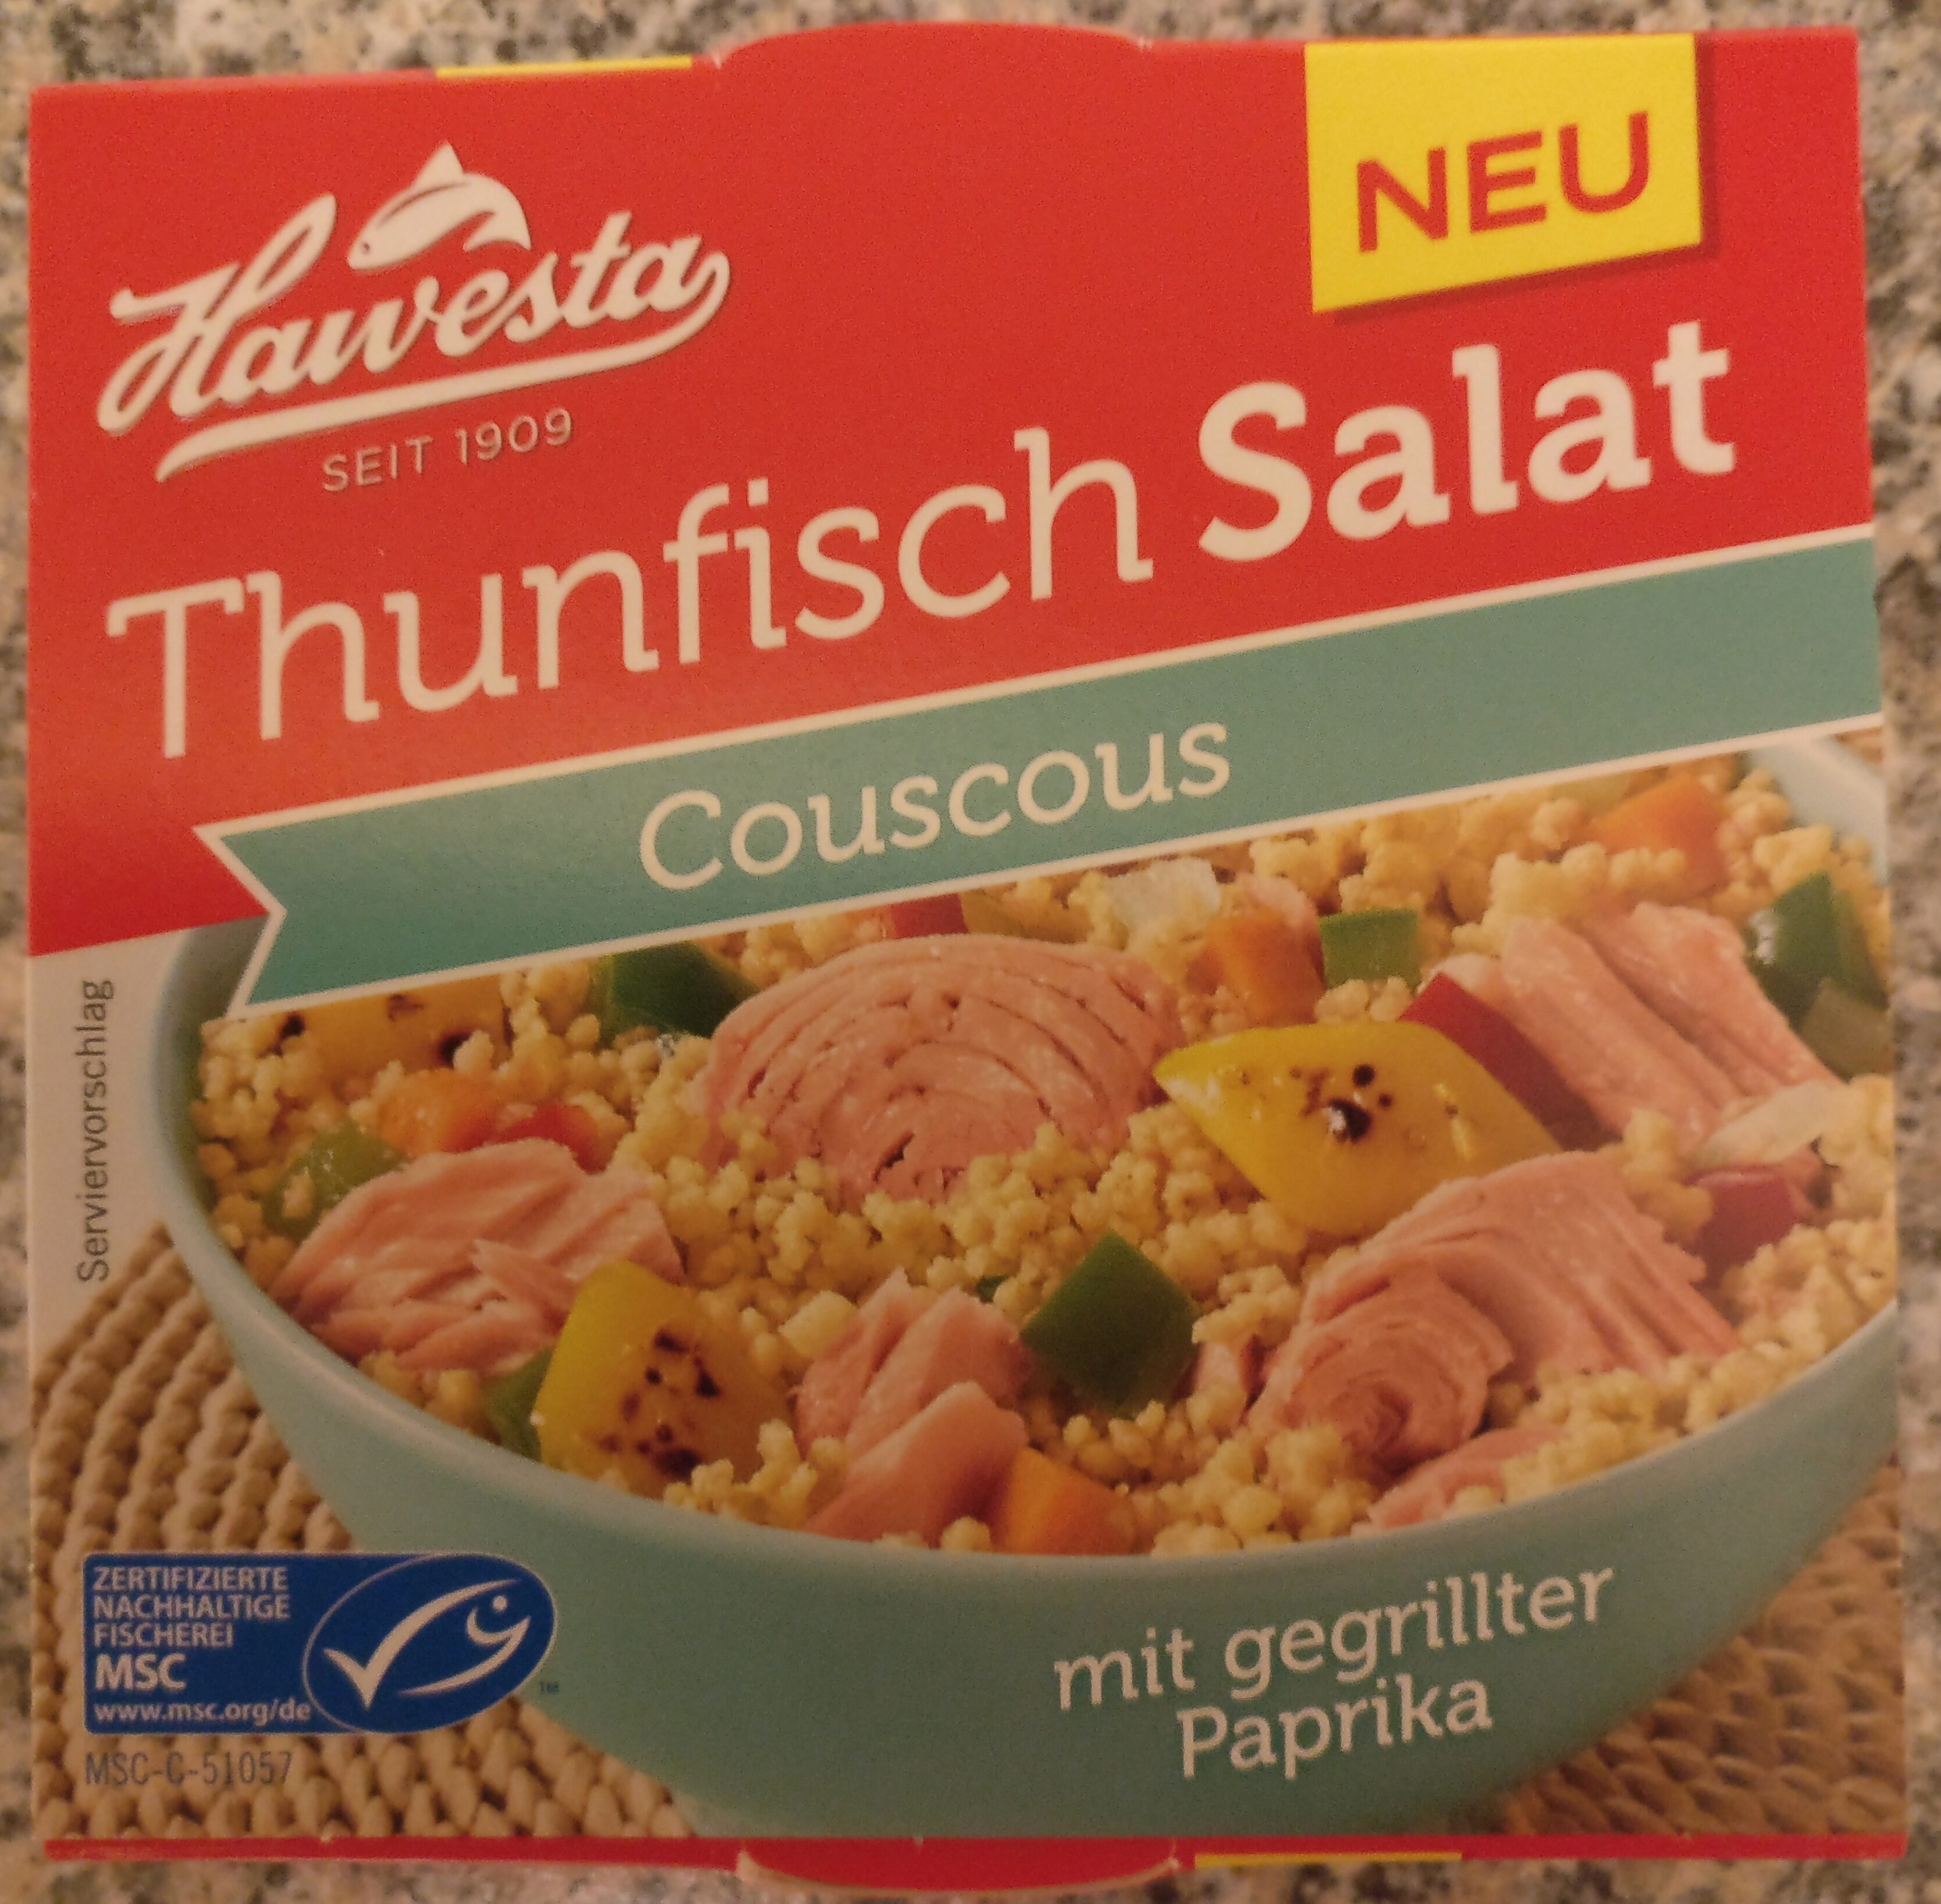 Thunfischsalat Couscous - Product - de